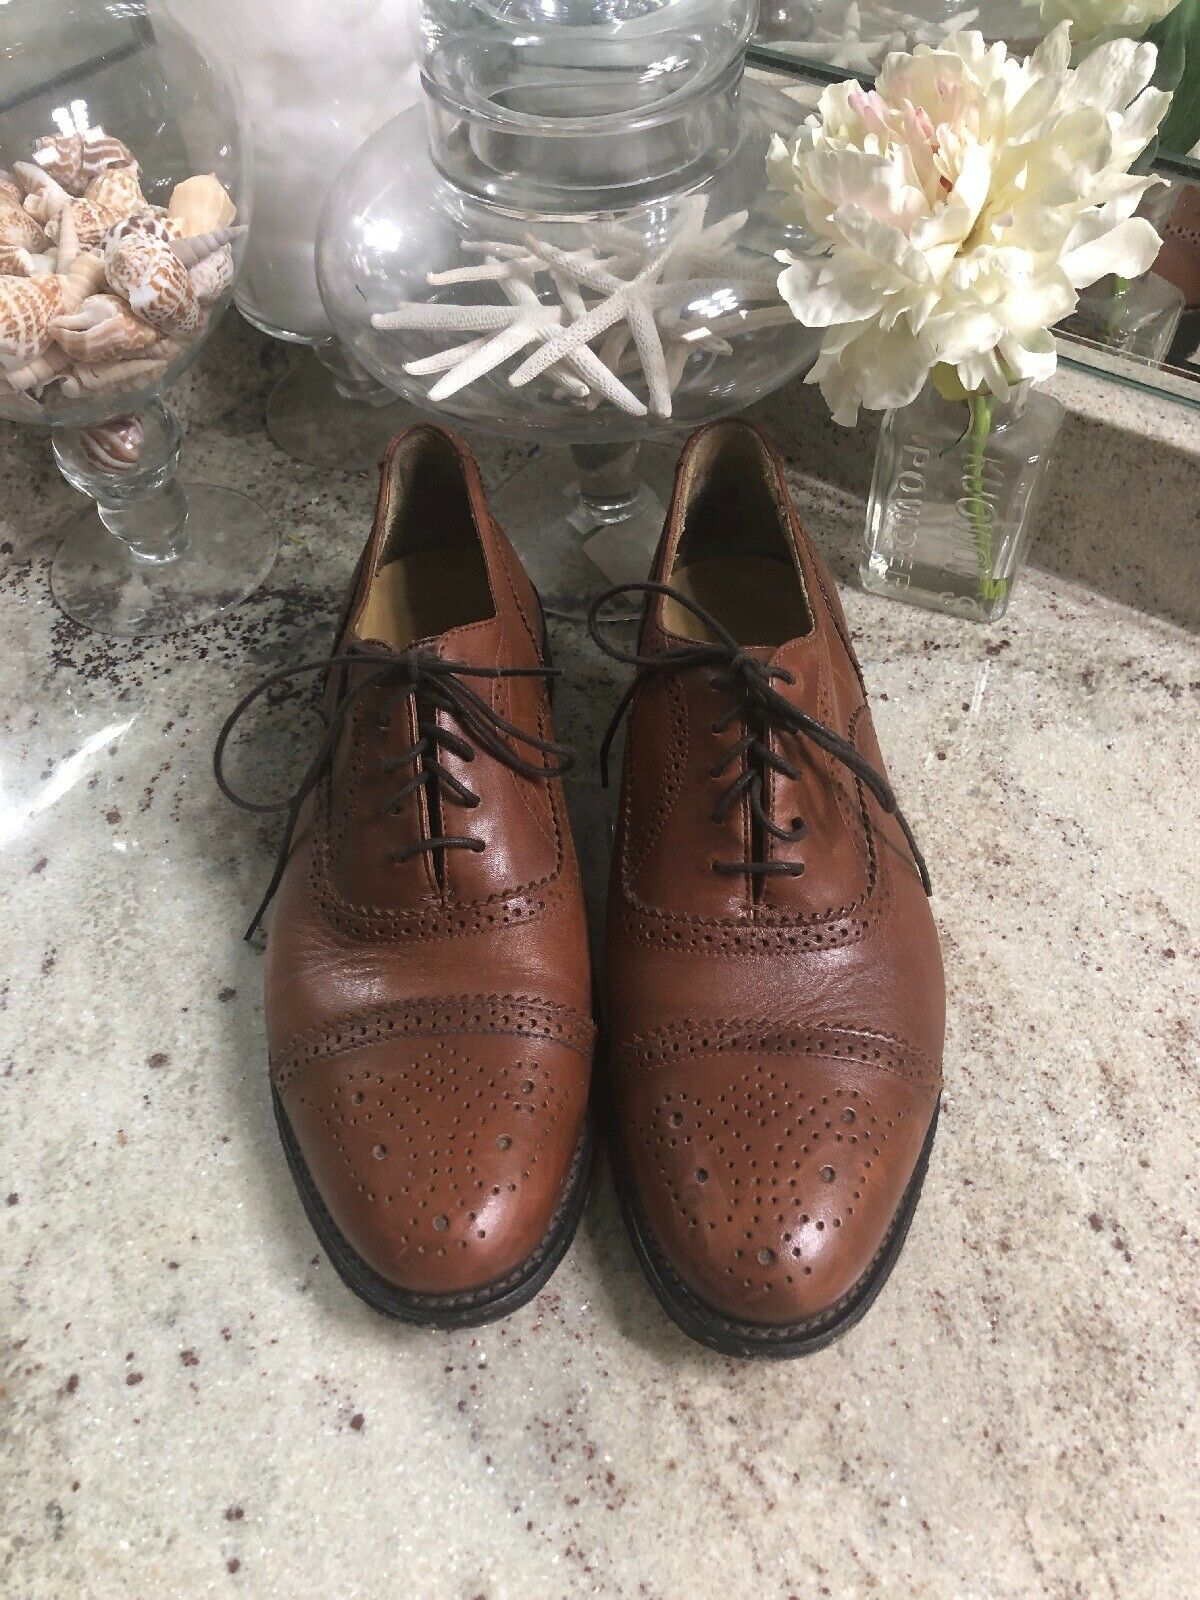 Men's  346  Brooks Bredhers Tan Brown Leather Brogue Wingtip shoes Sz 9 1 2 D